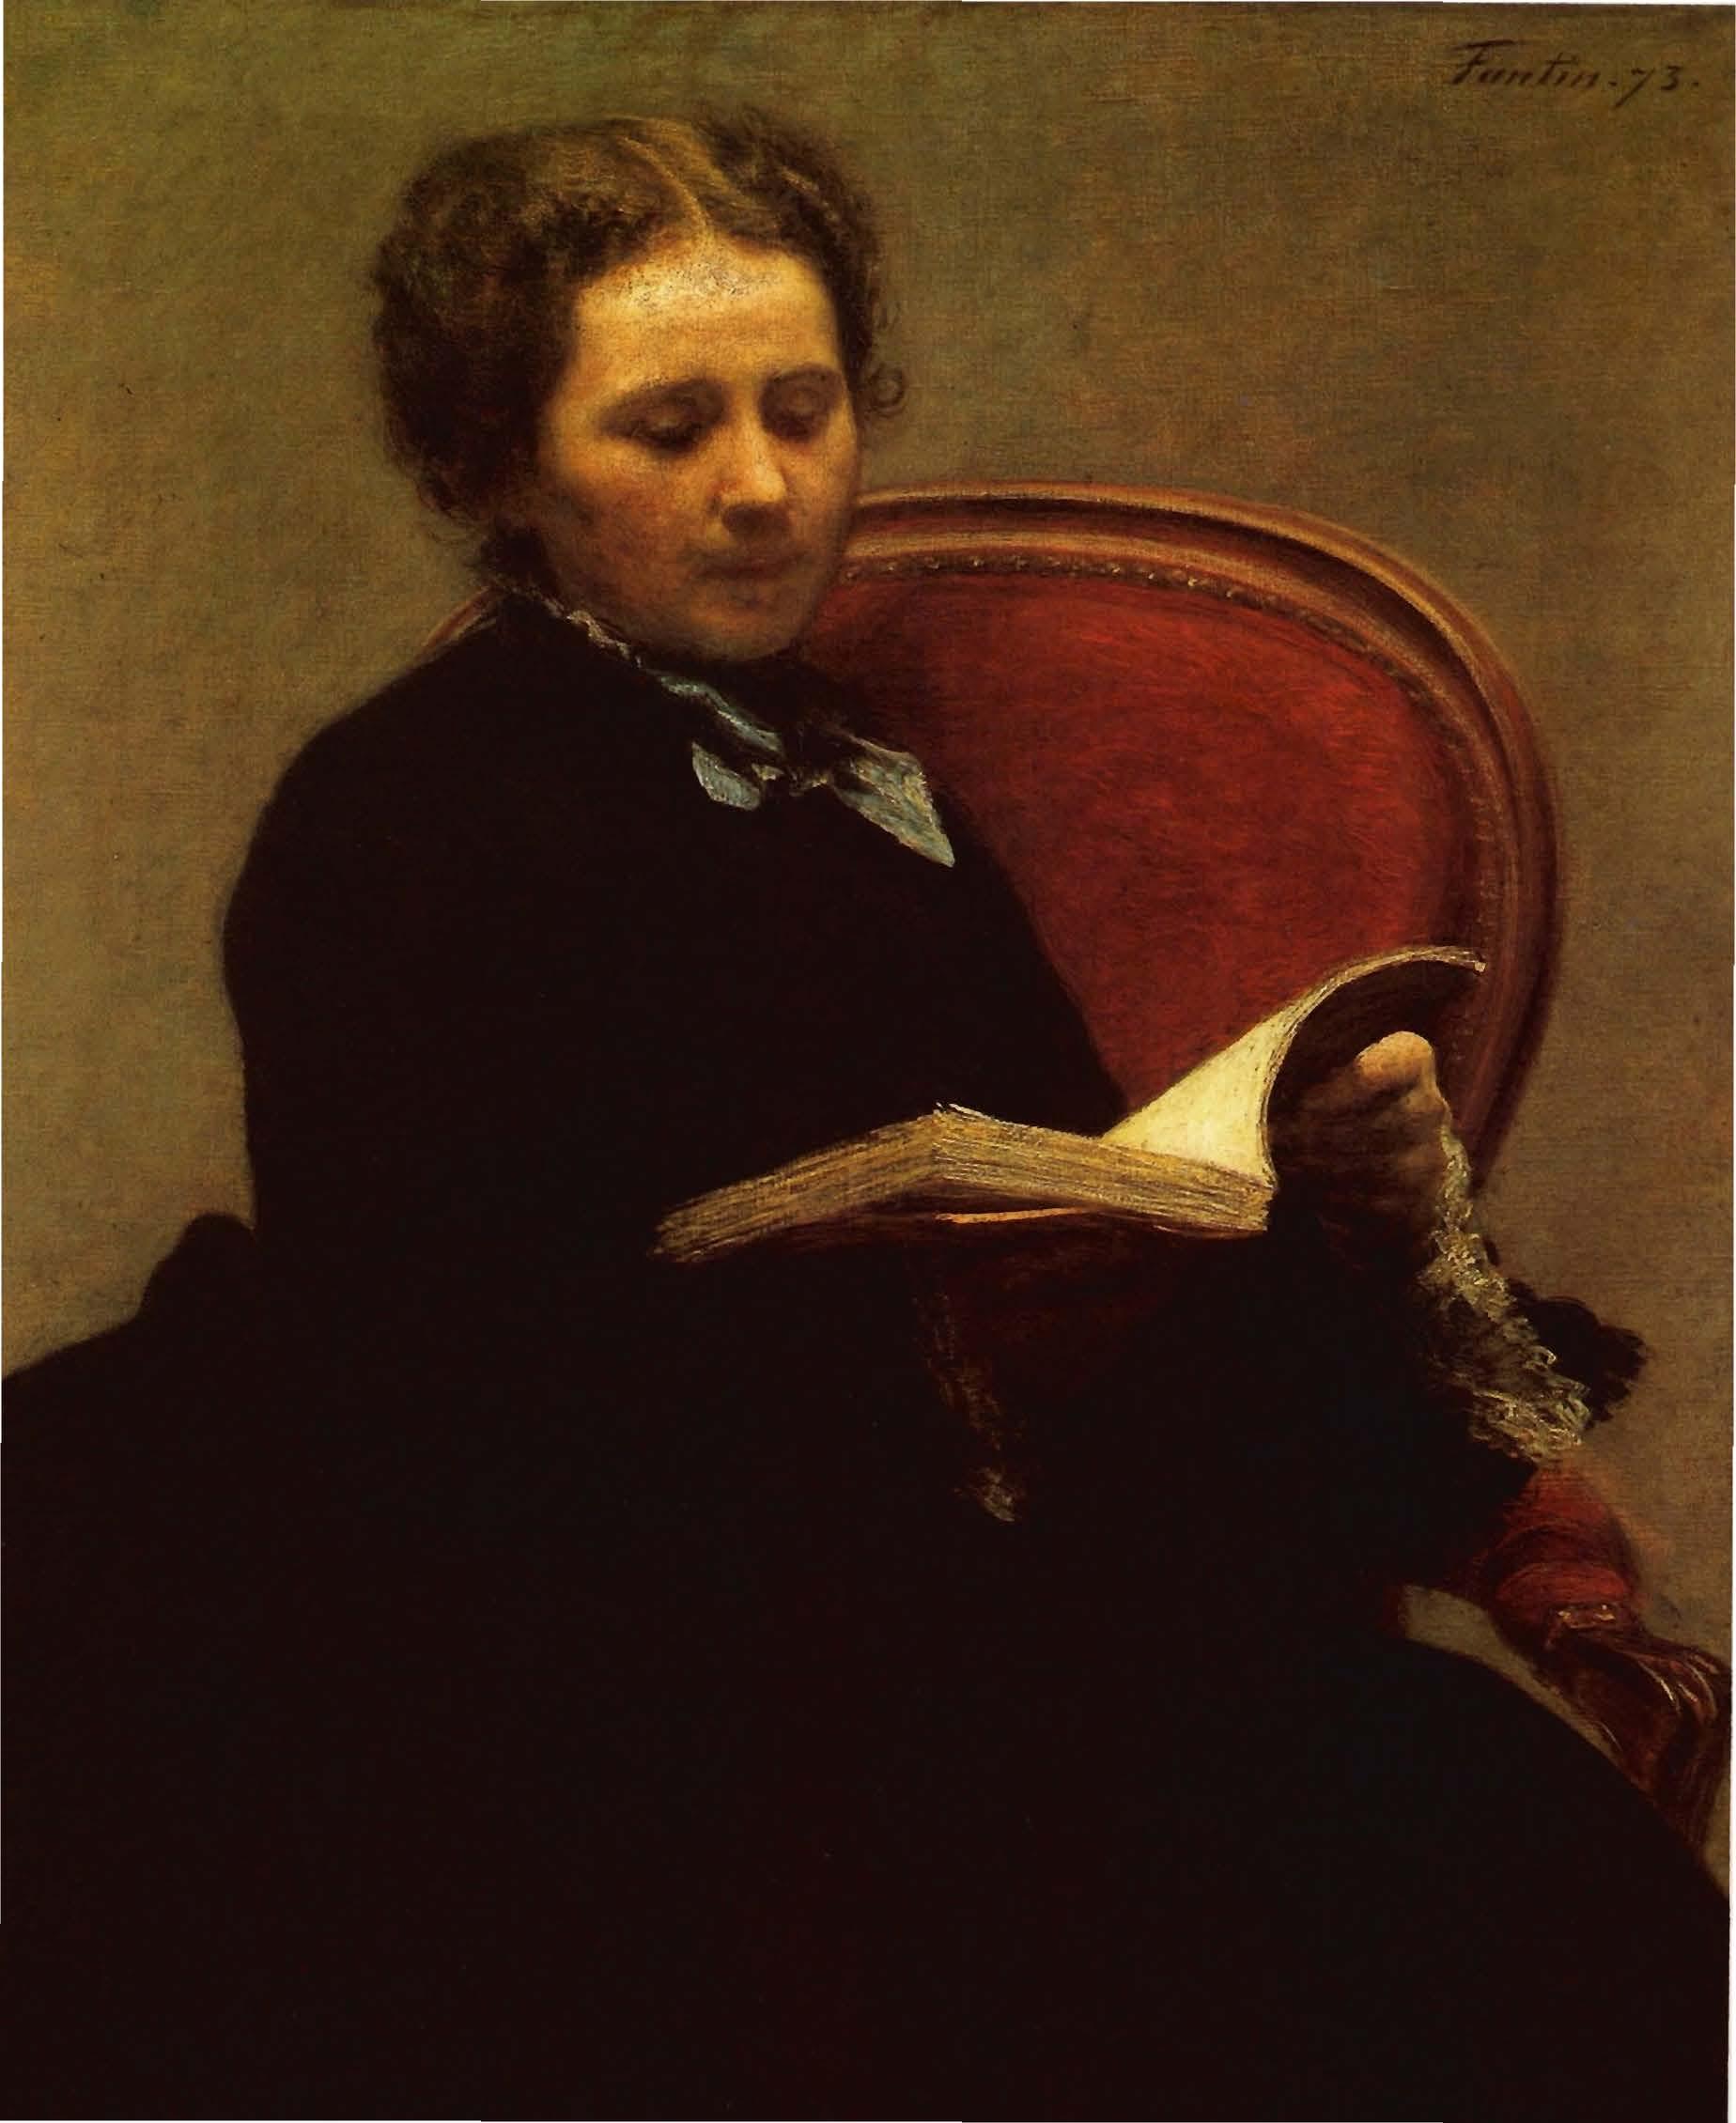 Victoria de Henri Fantin-Latour